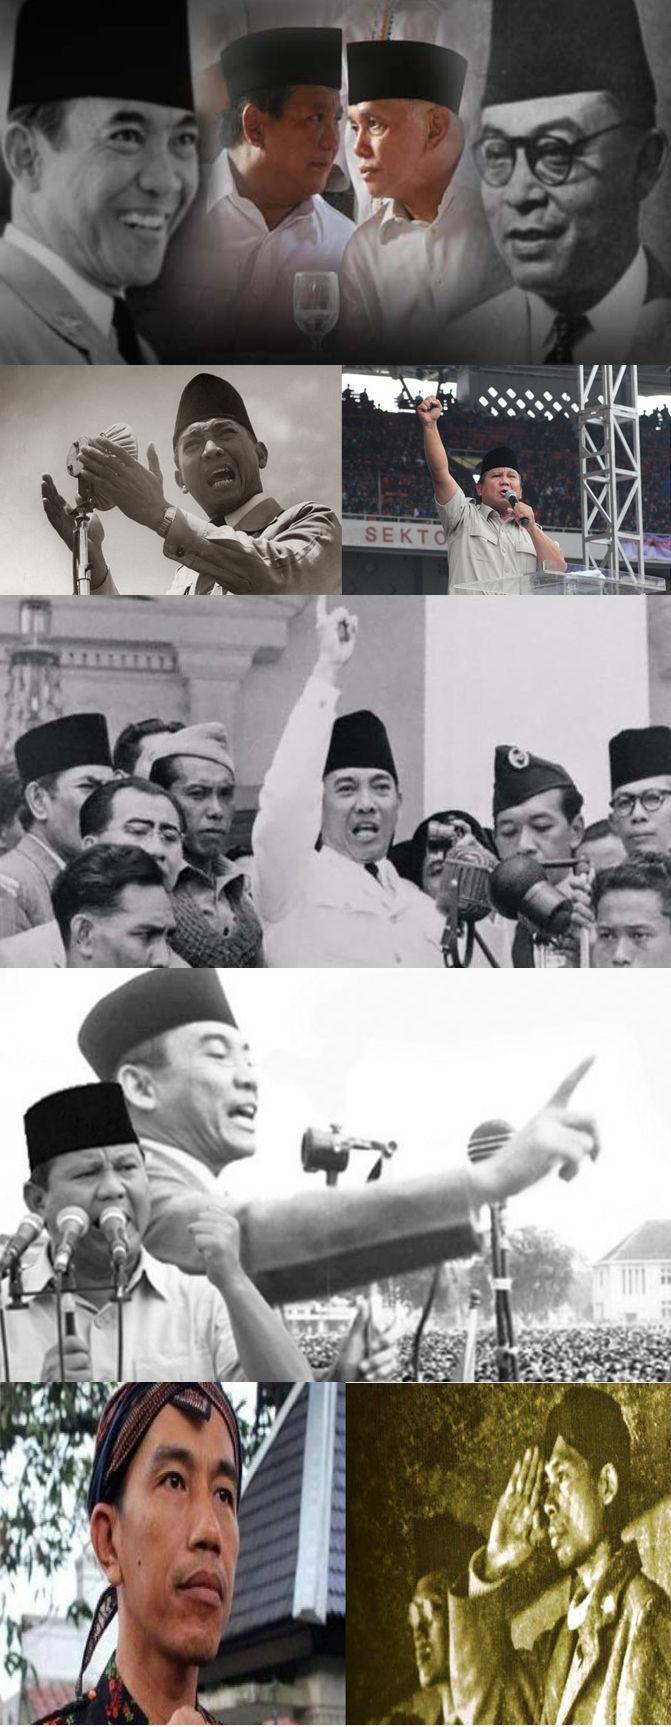 Sobat Pulsk, inilah kemiripan tokoh pahlawan nasional dengan calon kandidat Presiden Indonesia. Bapak Prabowo mirip Presiden Soekarno, kalau Bapak Jokowi mirip Jenderal Sudirman. Jadi kira-kira siapa ya yang pantas menaji presiden RI, kita lihat saja pada tanggal 9 Juli 2014 nanti. Semoga yang dipilih rakyat adalah yang terbaik. Pokoknya tetap satu Indonesiaku.